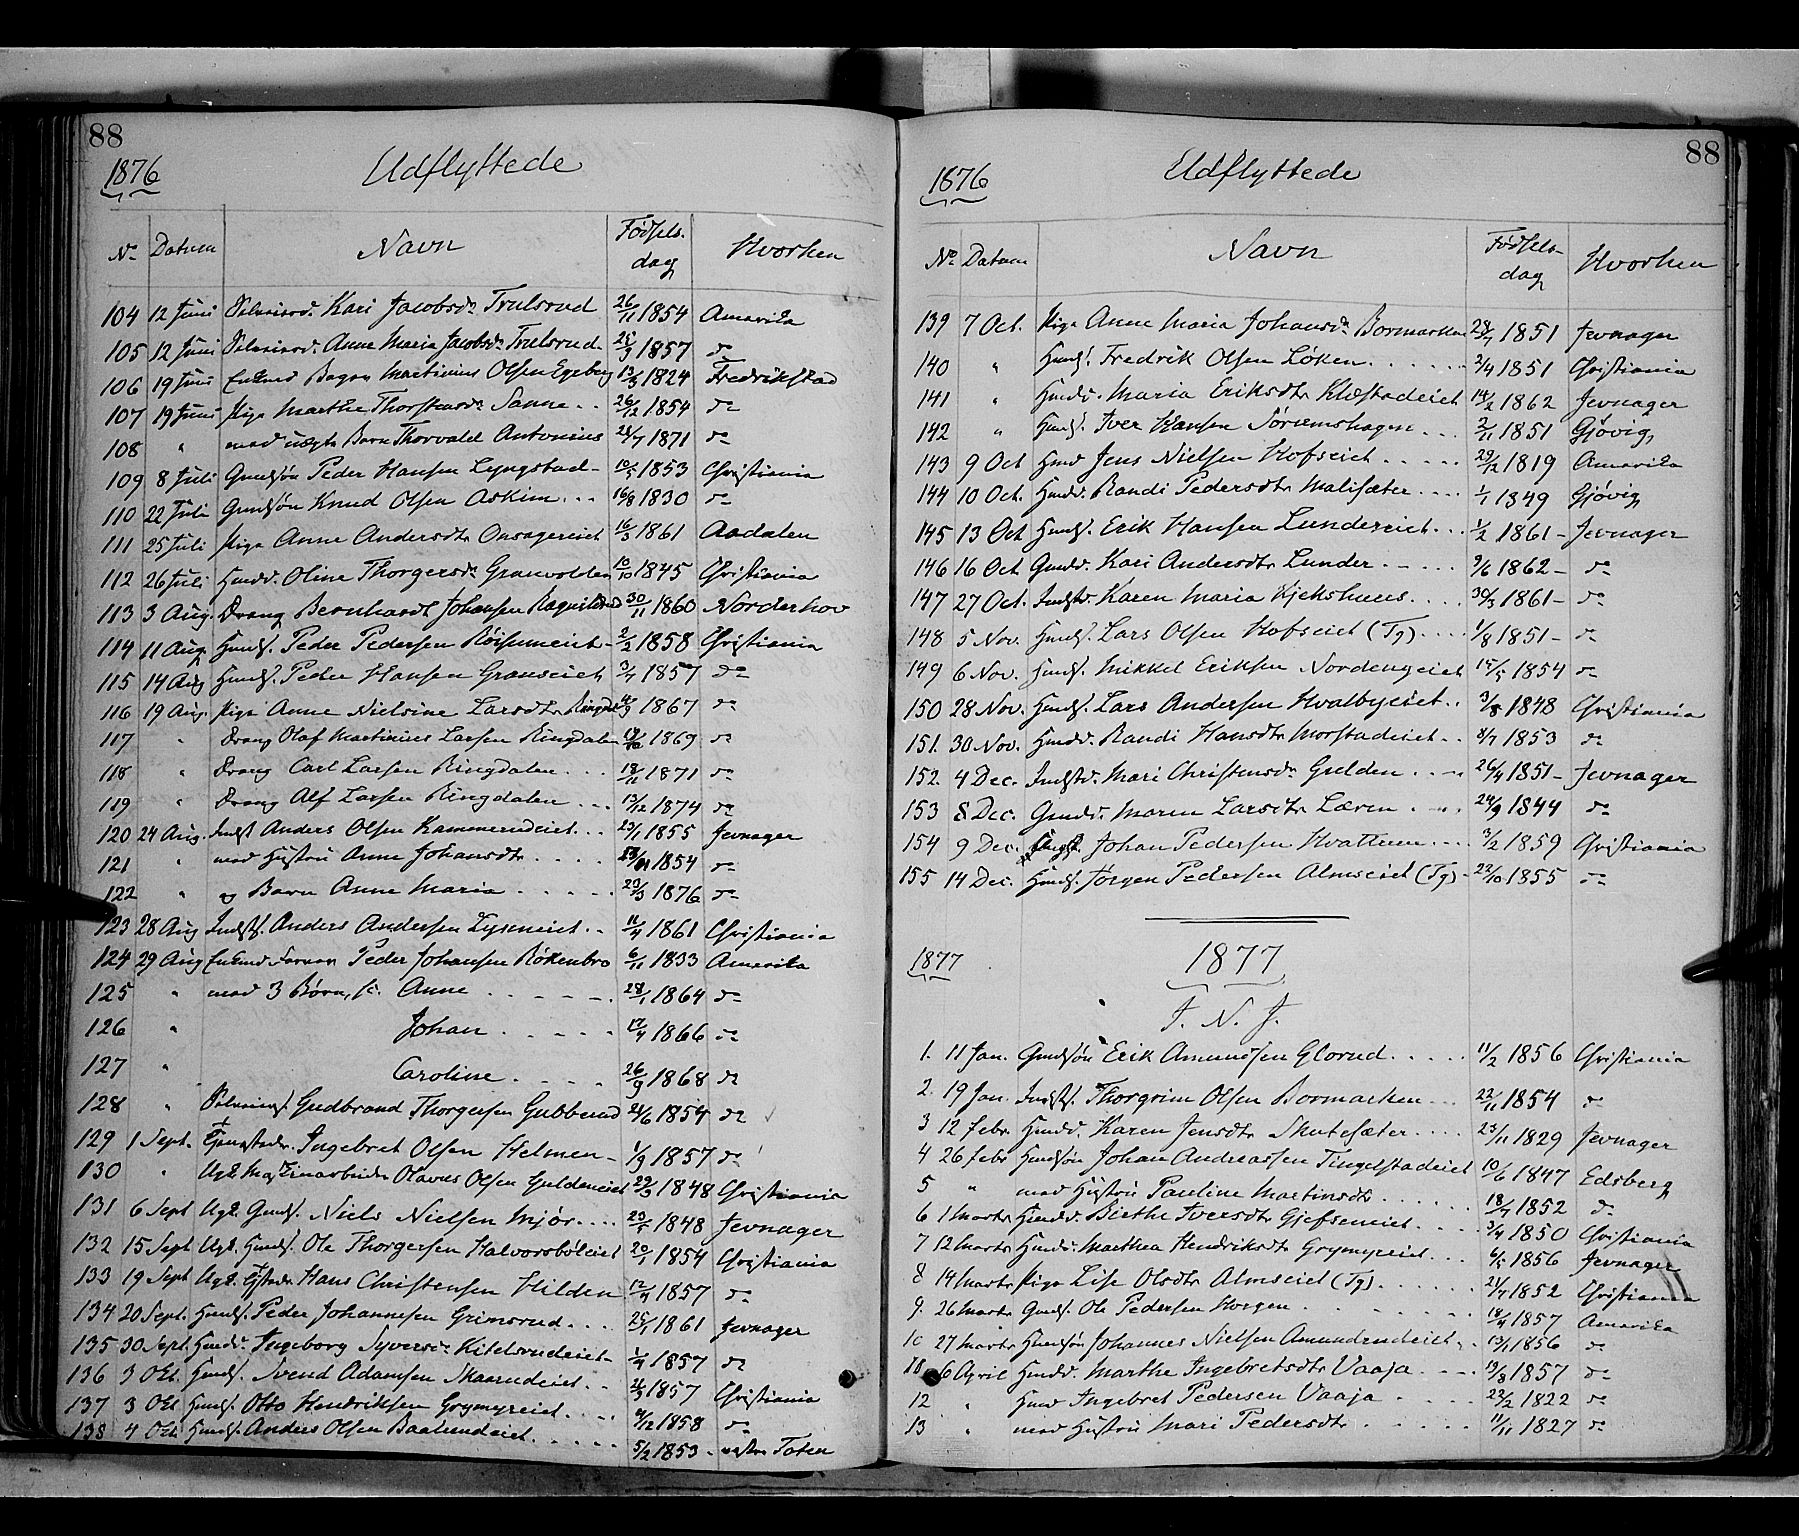 SAH, Gran prestekontor, Ministerialbok nr. 13, 1875-1879, s. 88